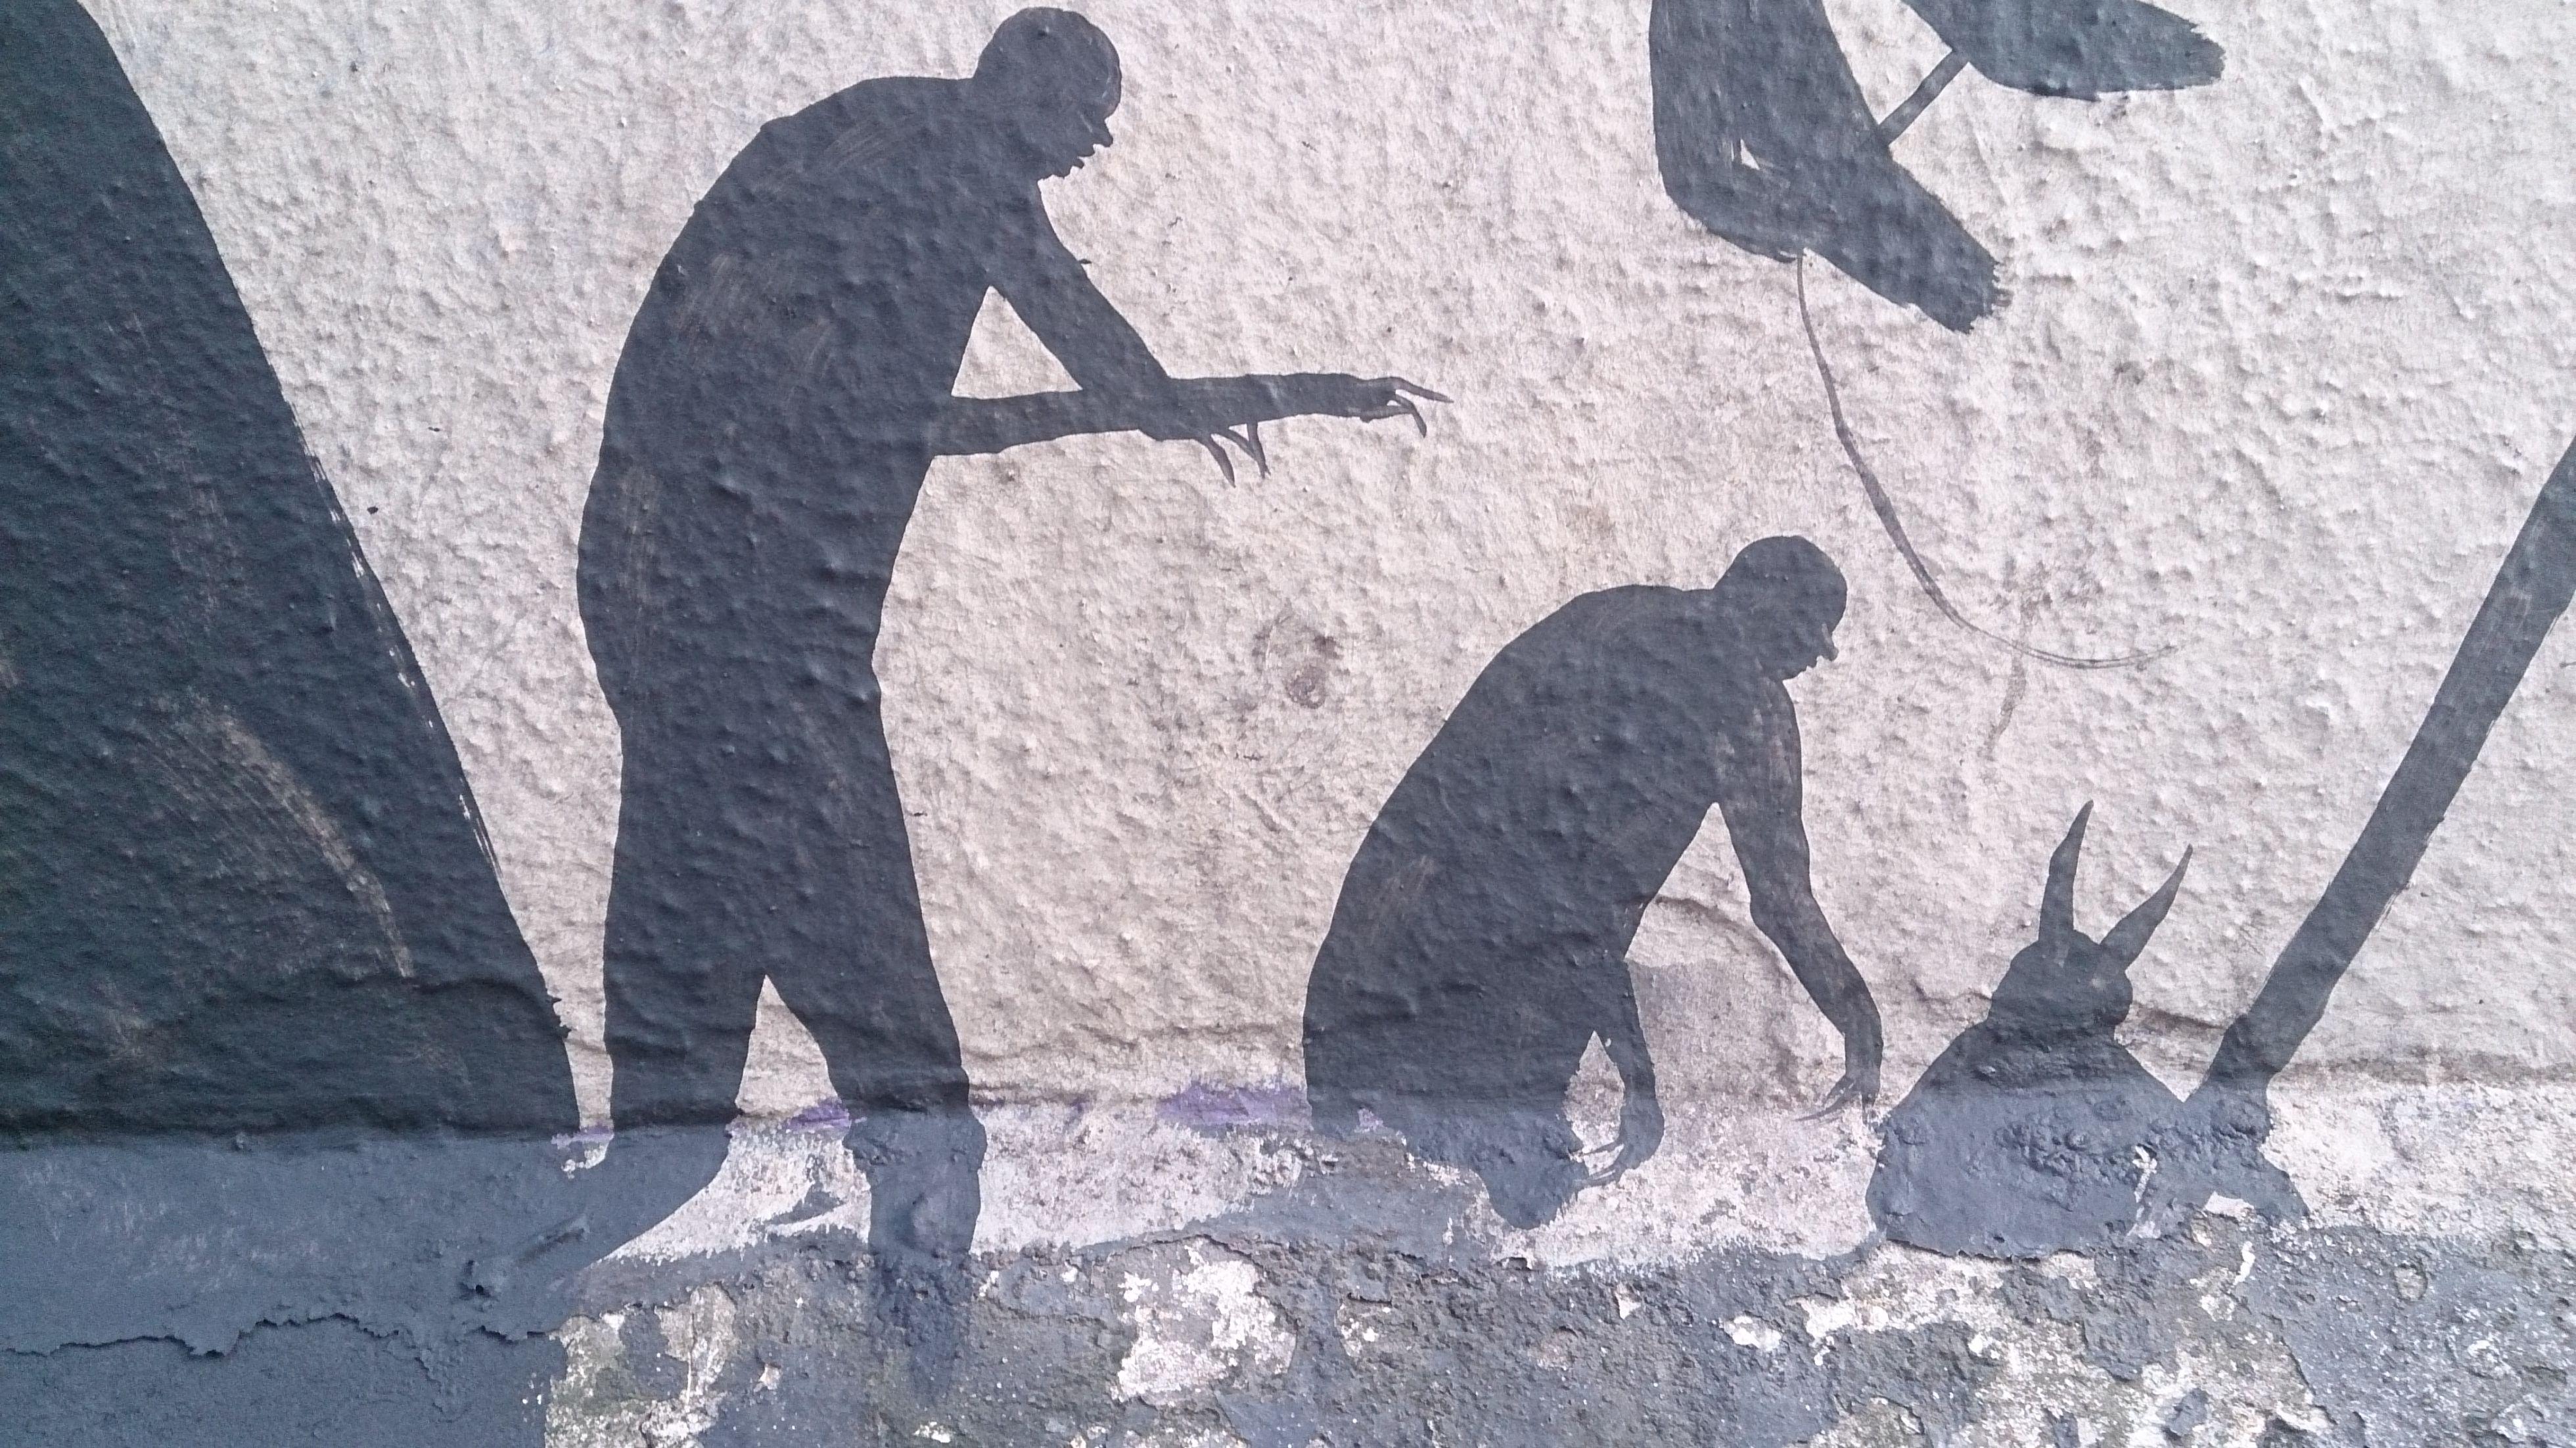 David De La Mano artwork for Empty Walls Festival 2014 Cardiff - detail